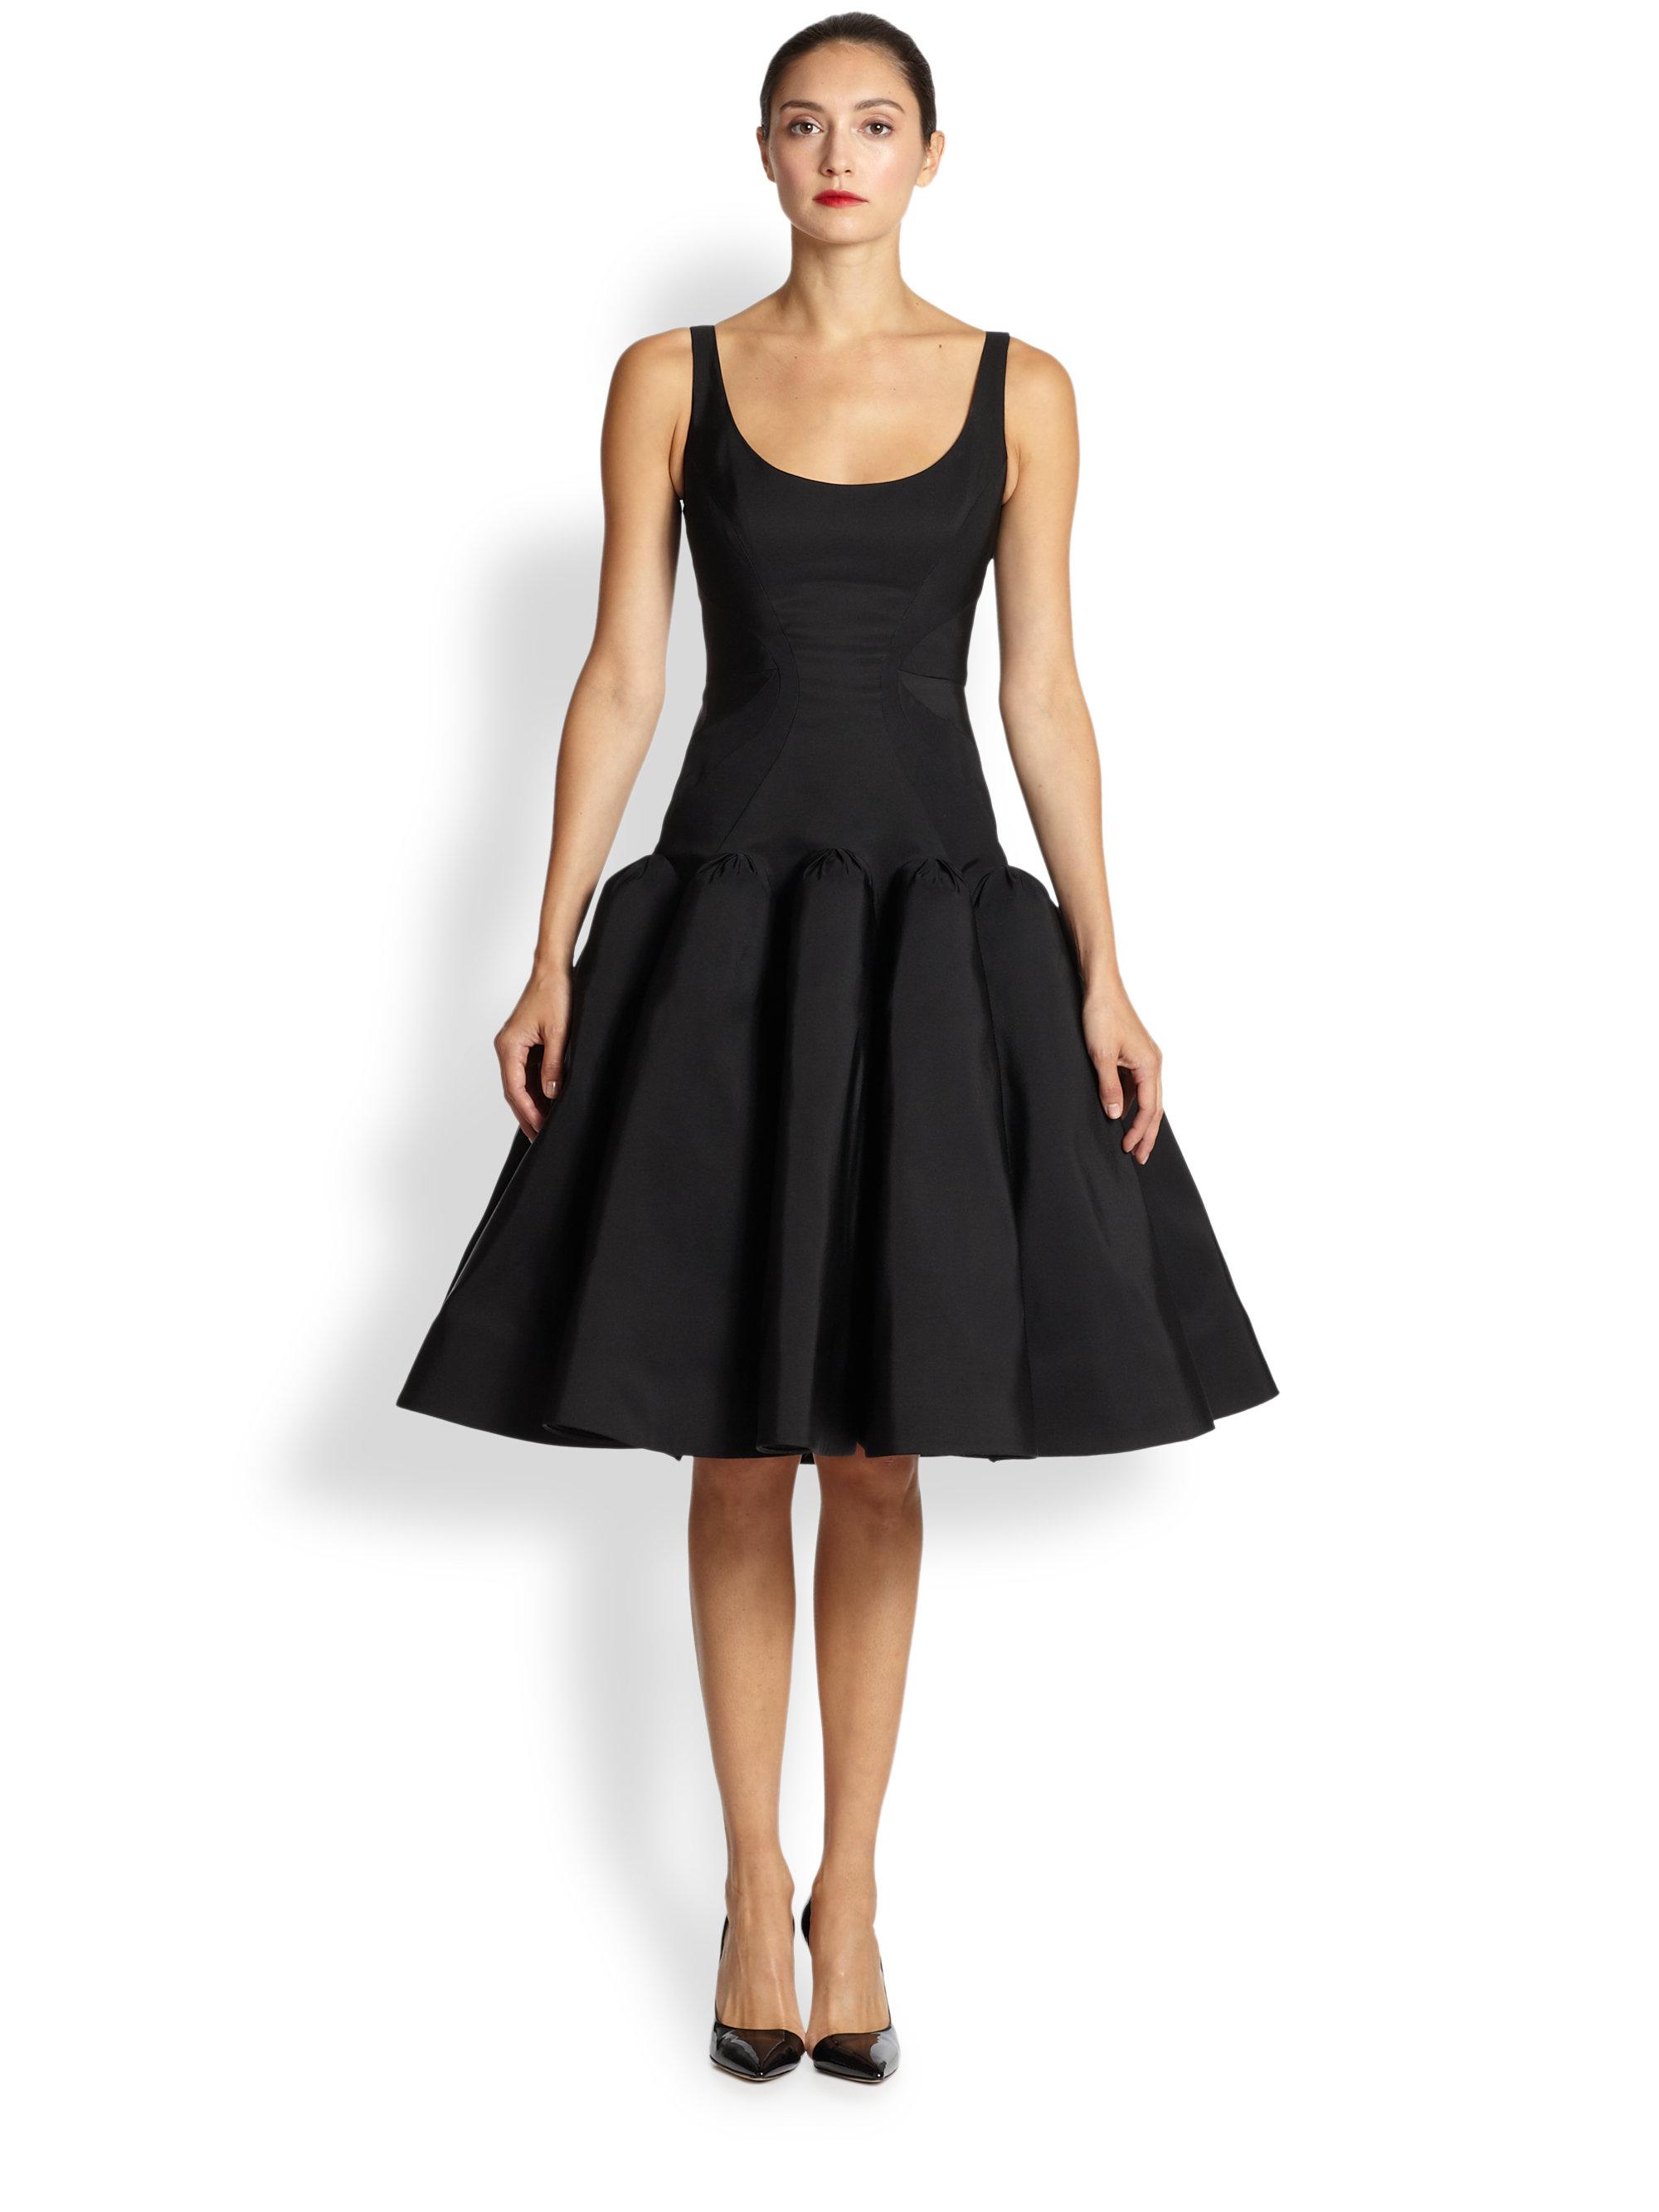 Black ballerina dress